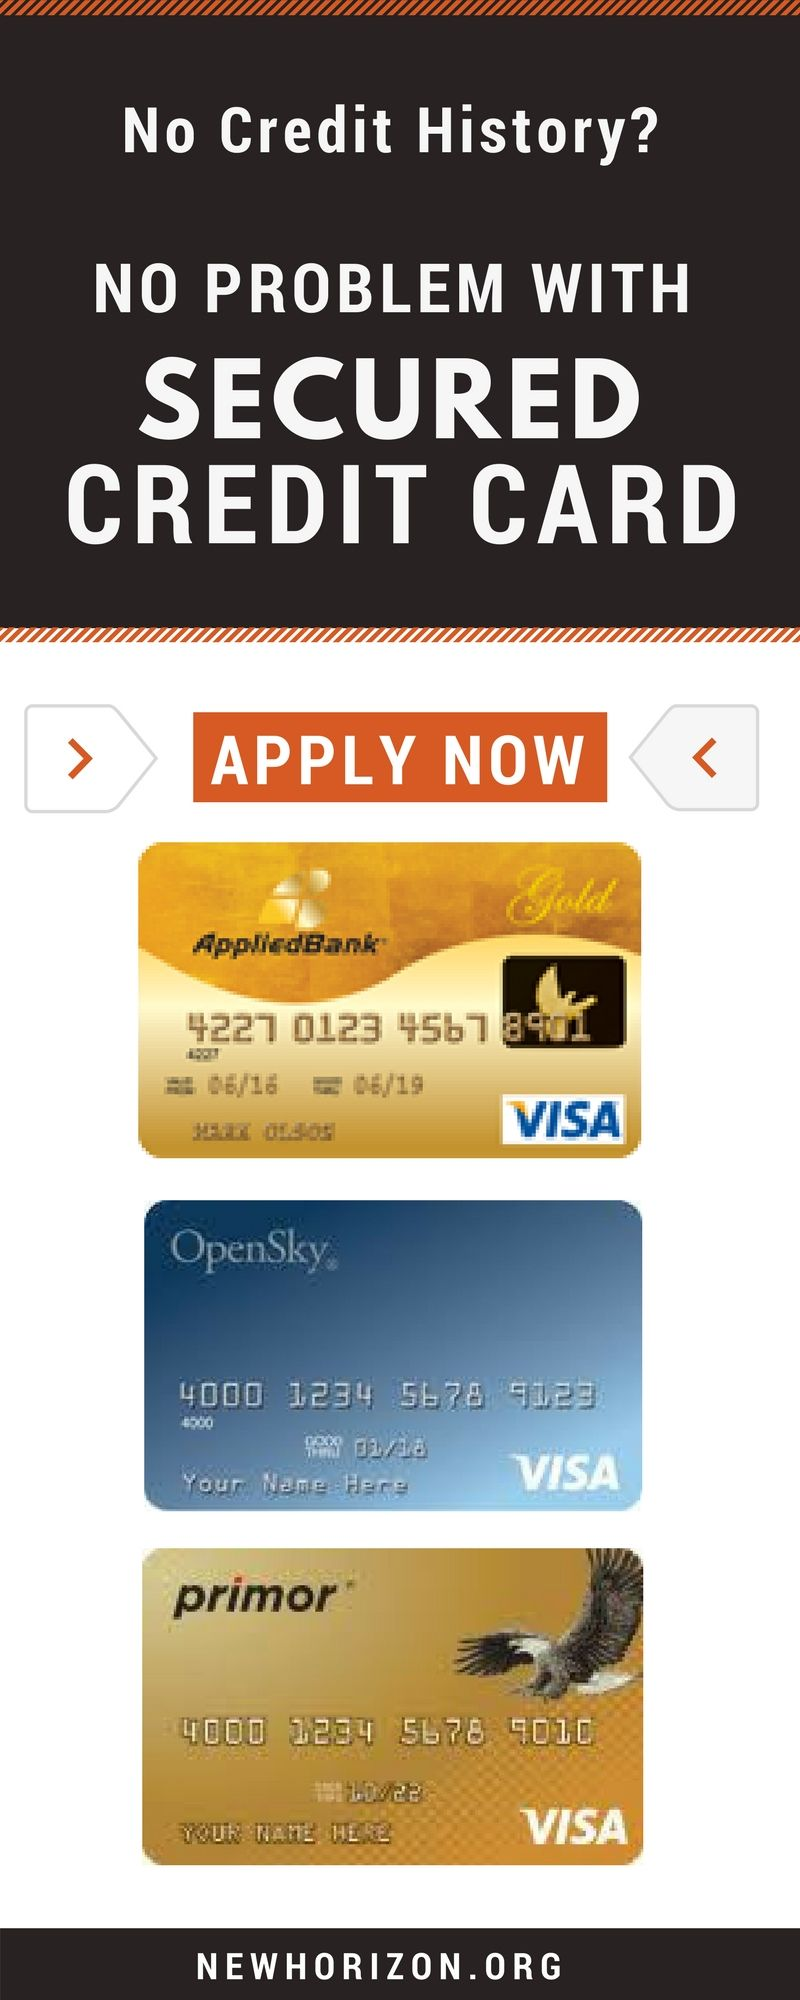 Secured Credit Cards Regardless Of Bad Credit Secure Credit Card Credit Card Hacks Bad Credit Credit Cards